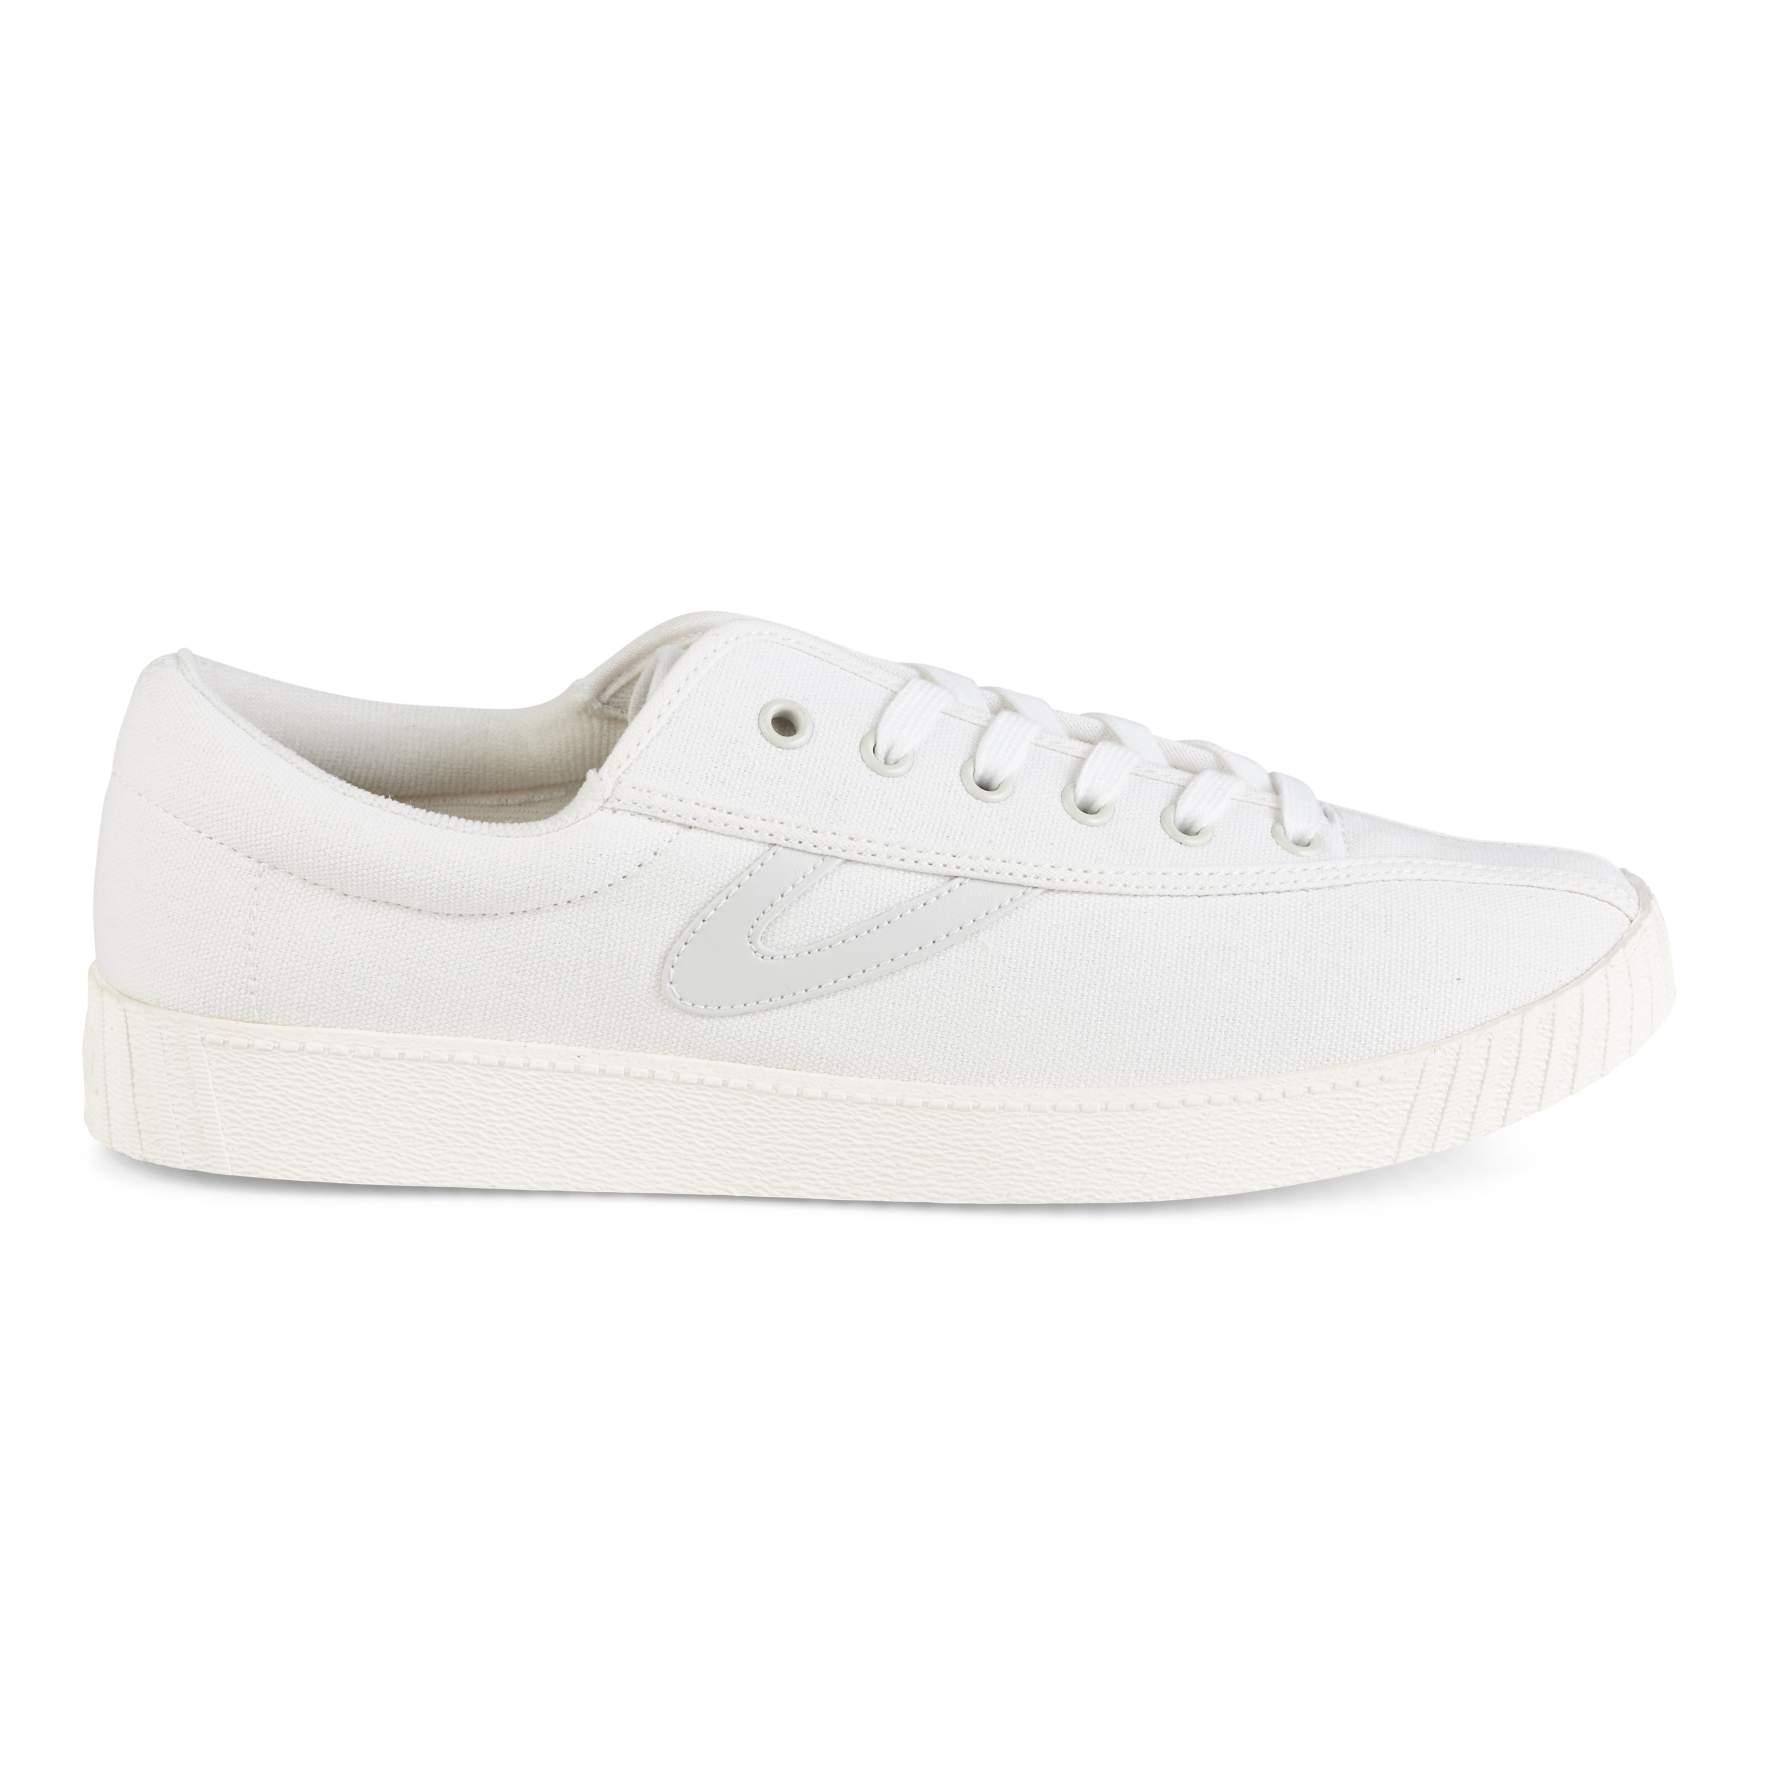 official photos 6cbc1 f2b3d Sneakers Dam   Shoppa Outlet Deals Online   Afound